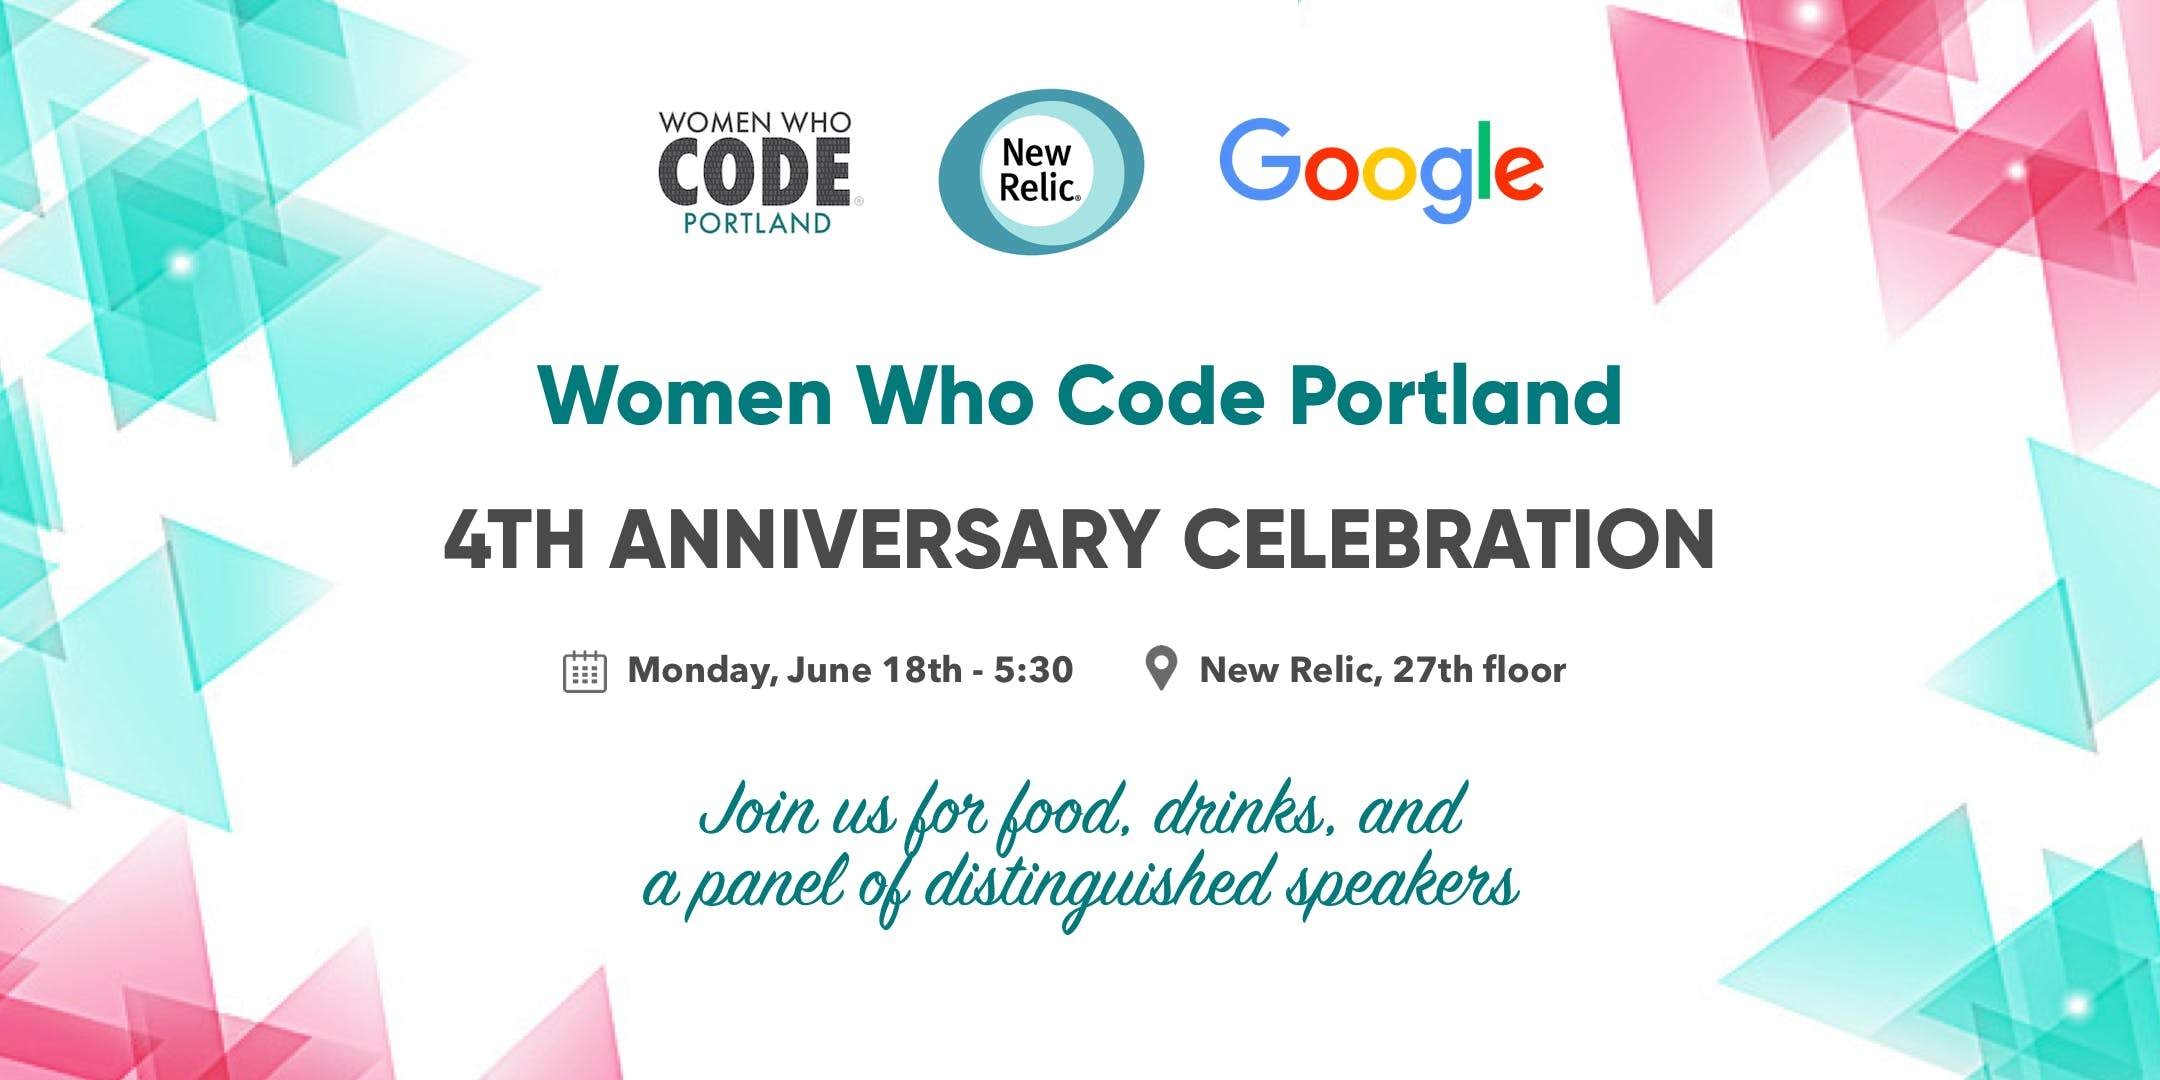 Women Who Code Portland - 4th Anniversary Cel